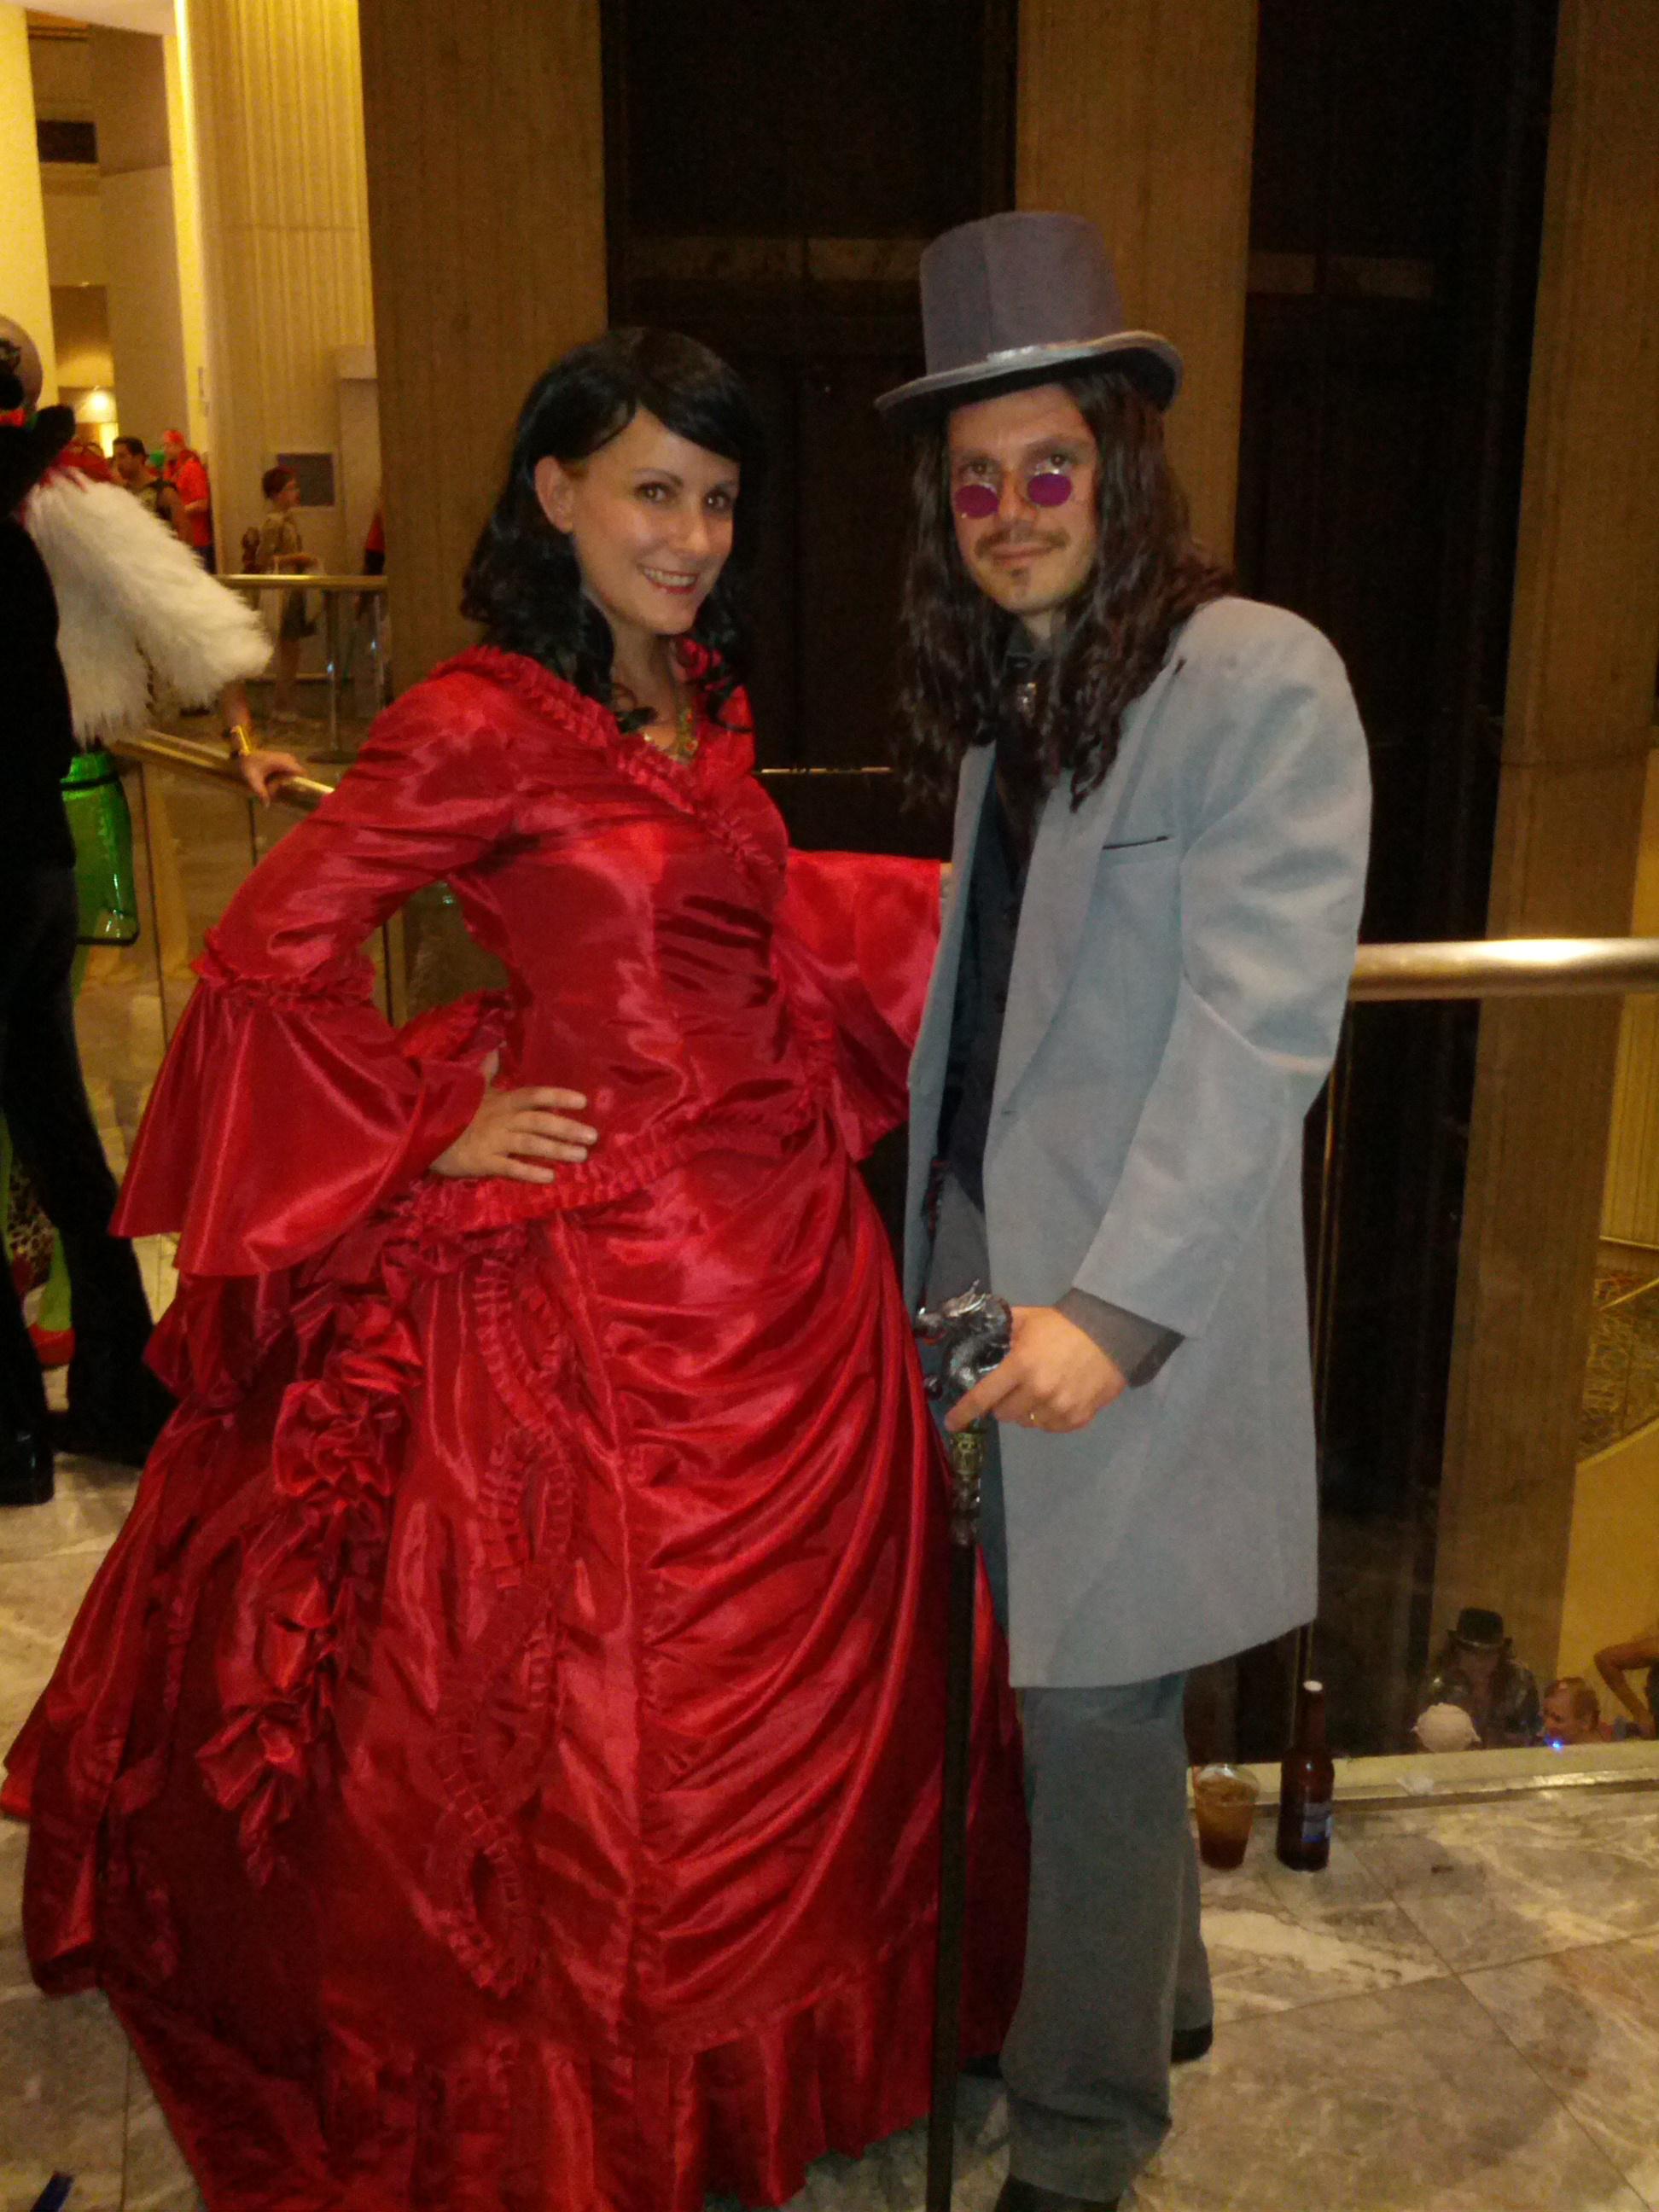 Mina and Dracula